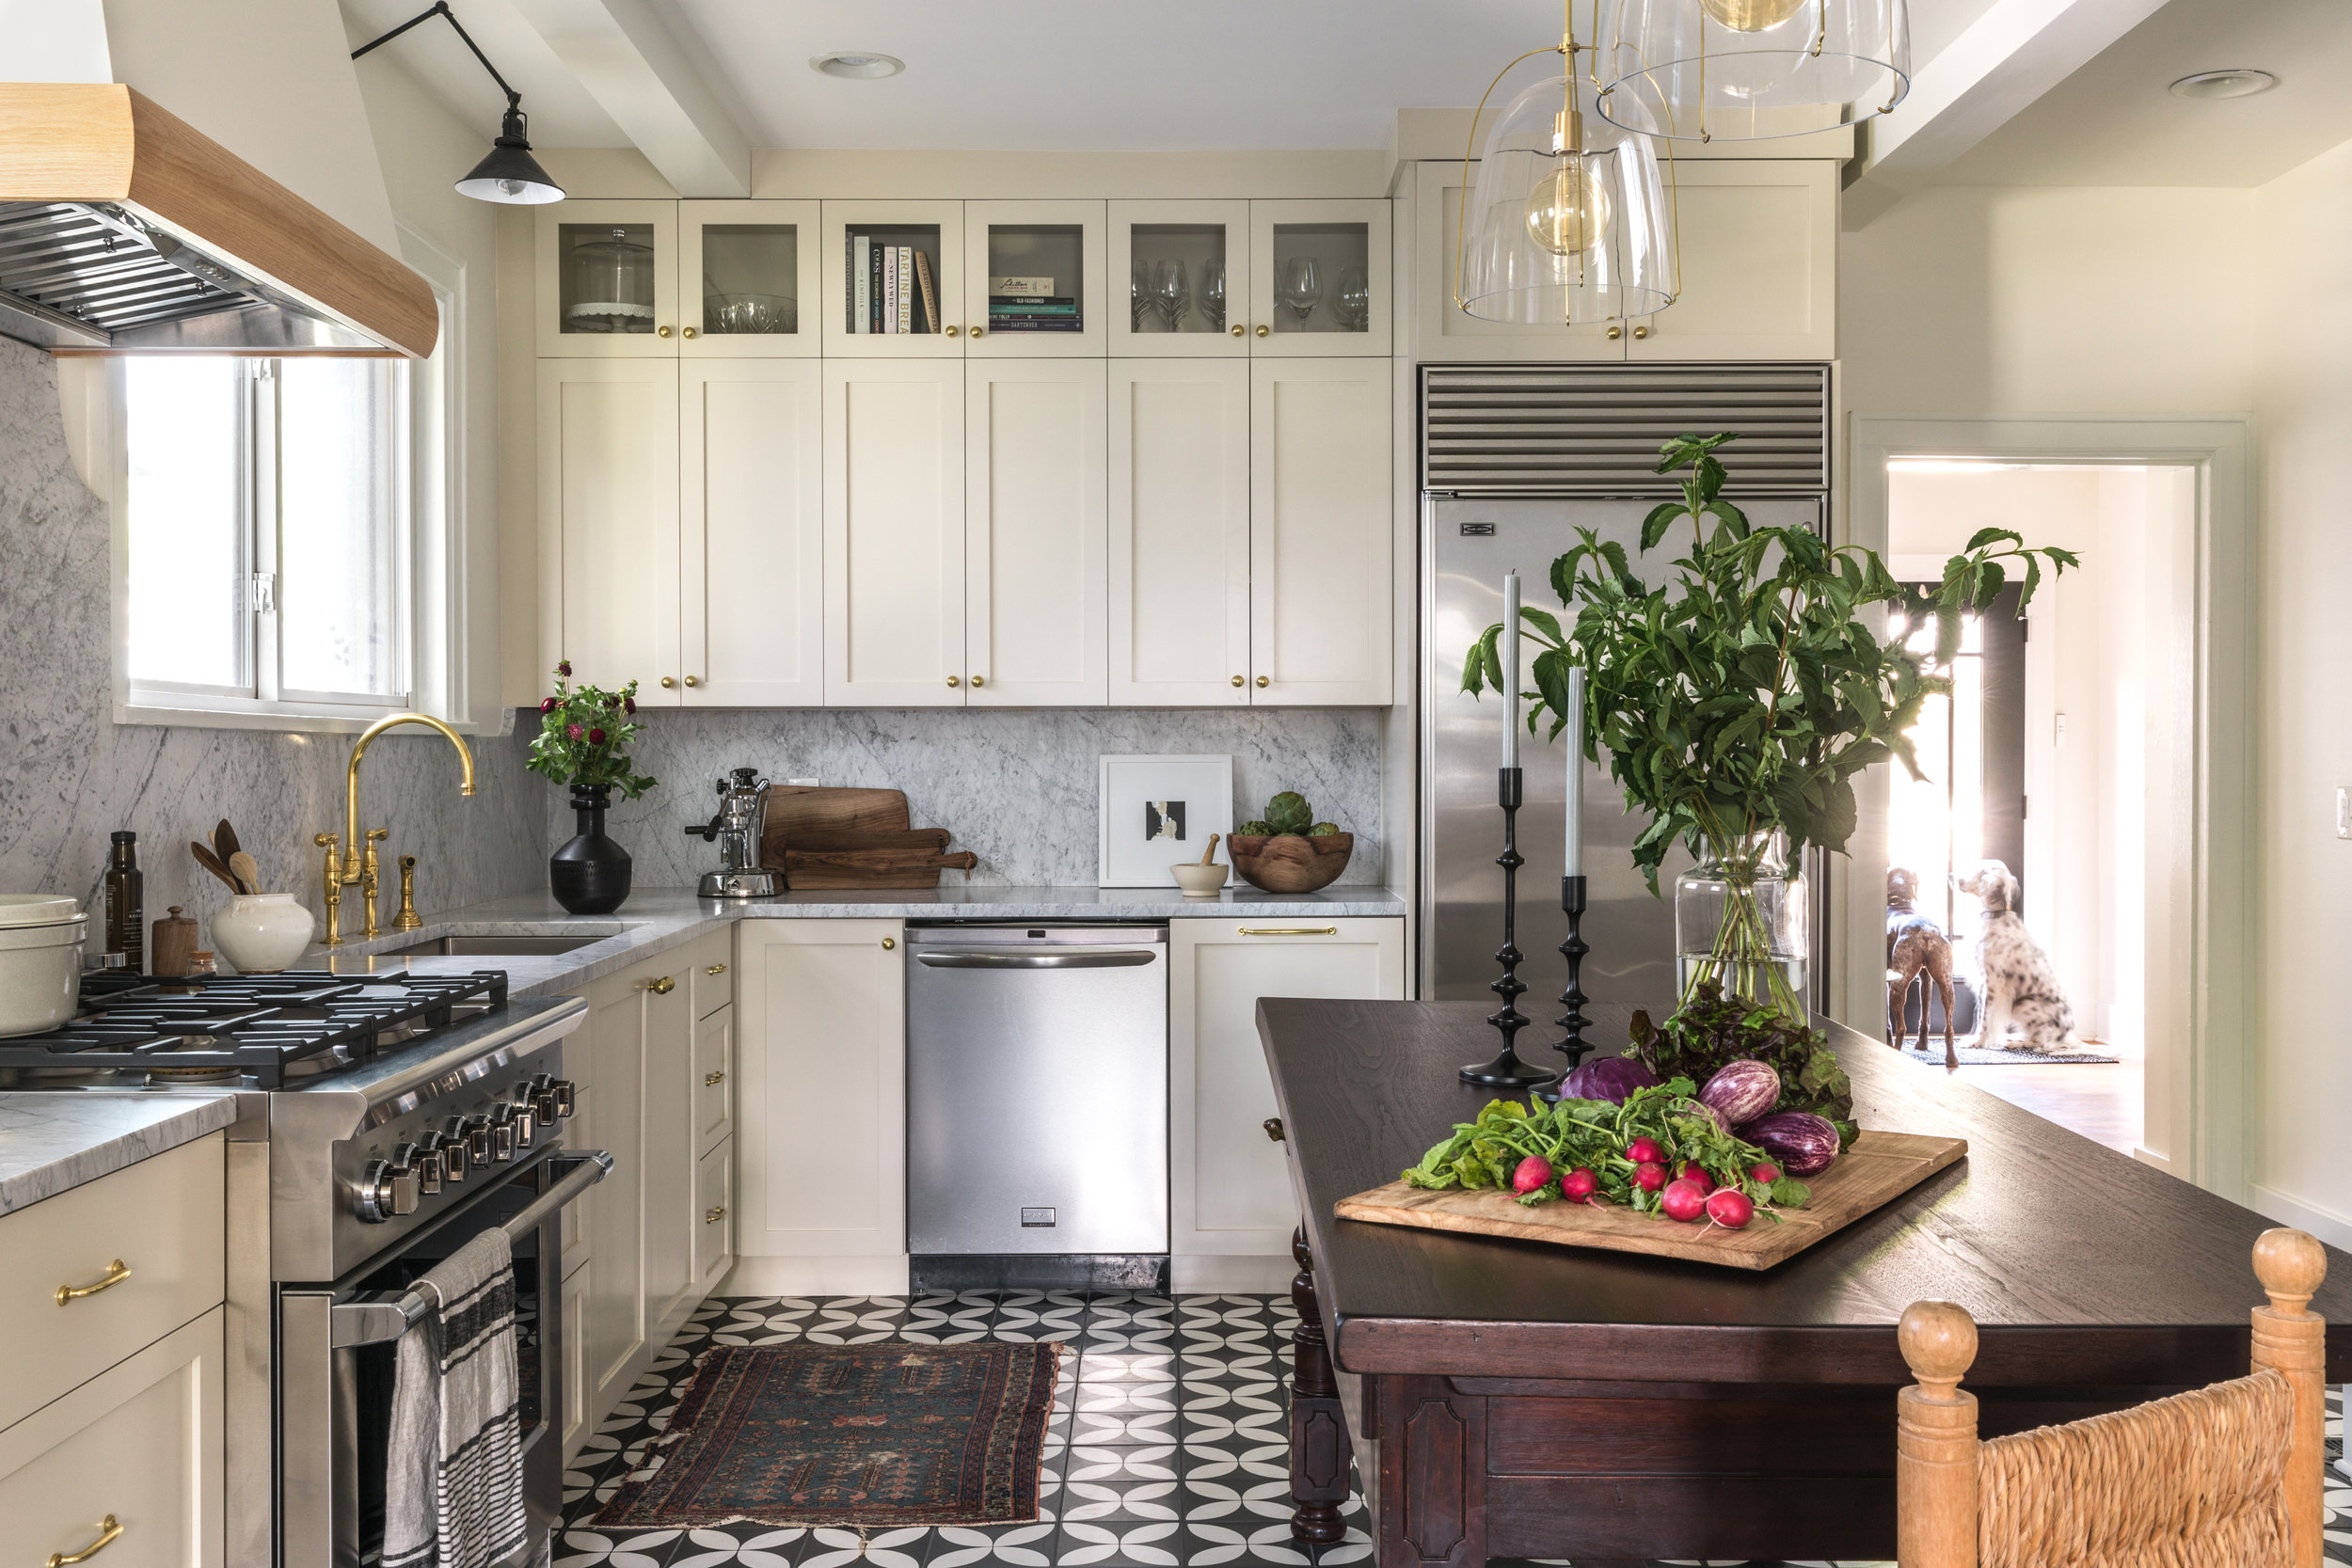 Lauren Bradshaw Design East Hill Kitchen Renovation 1.jpg